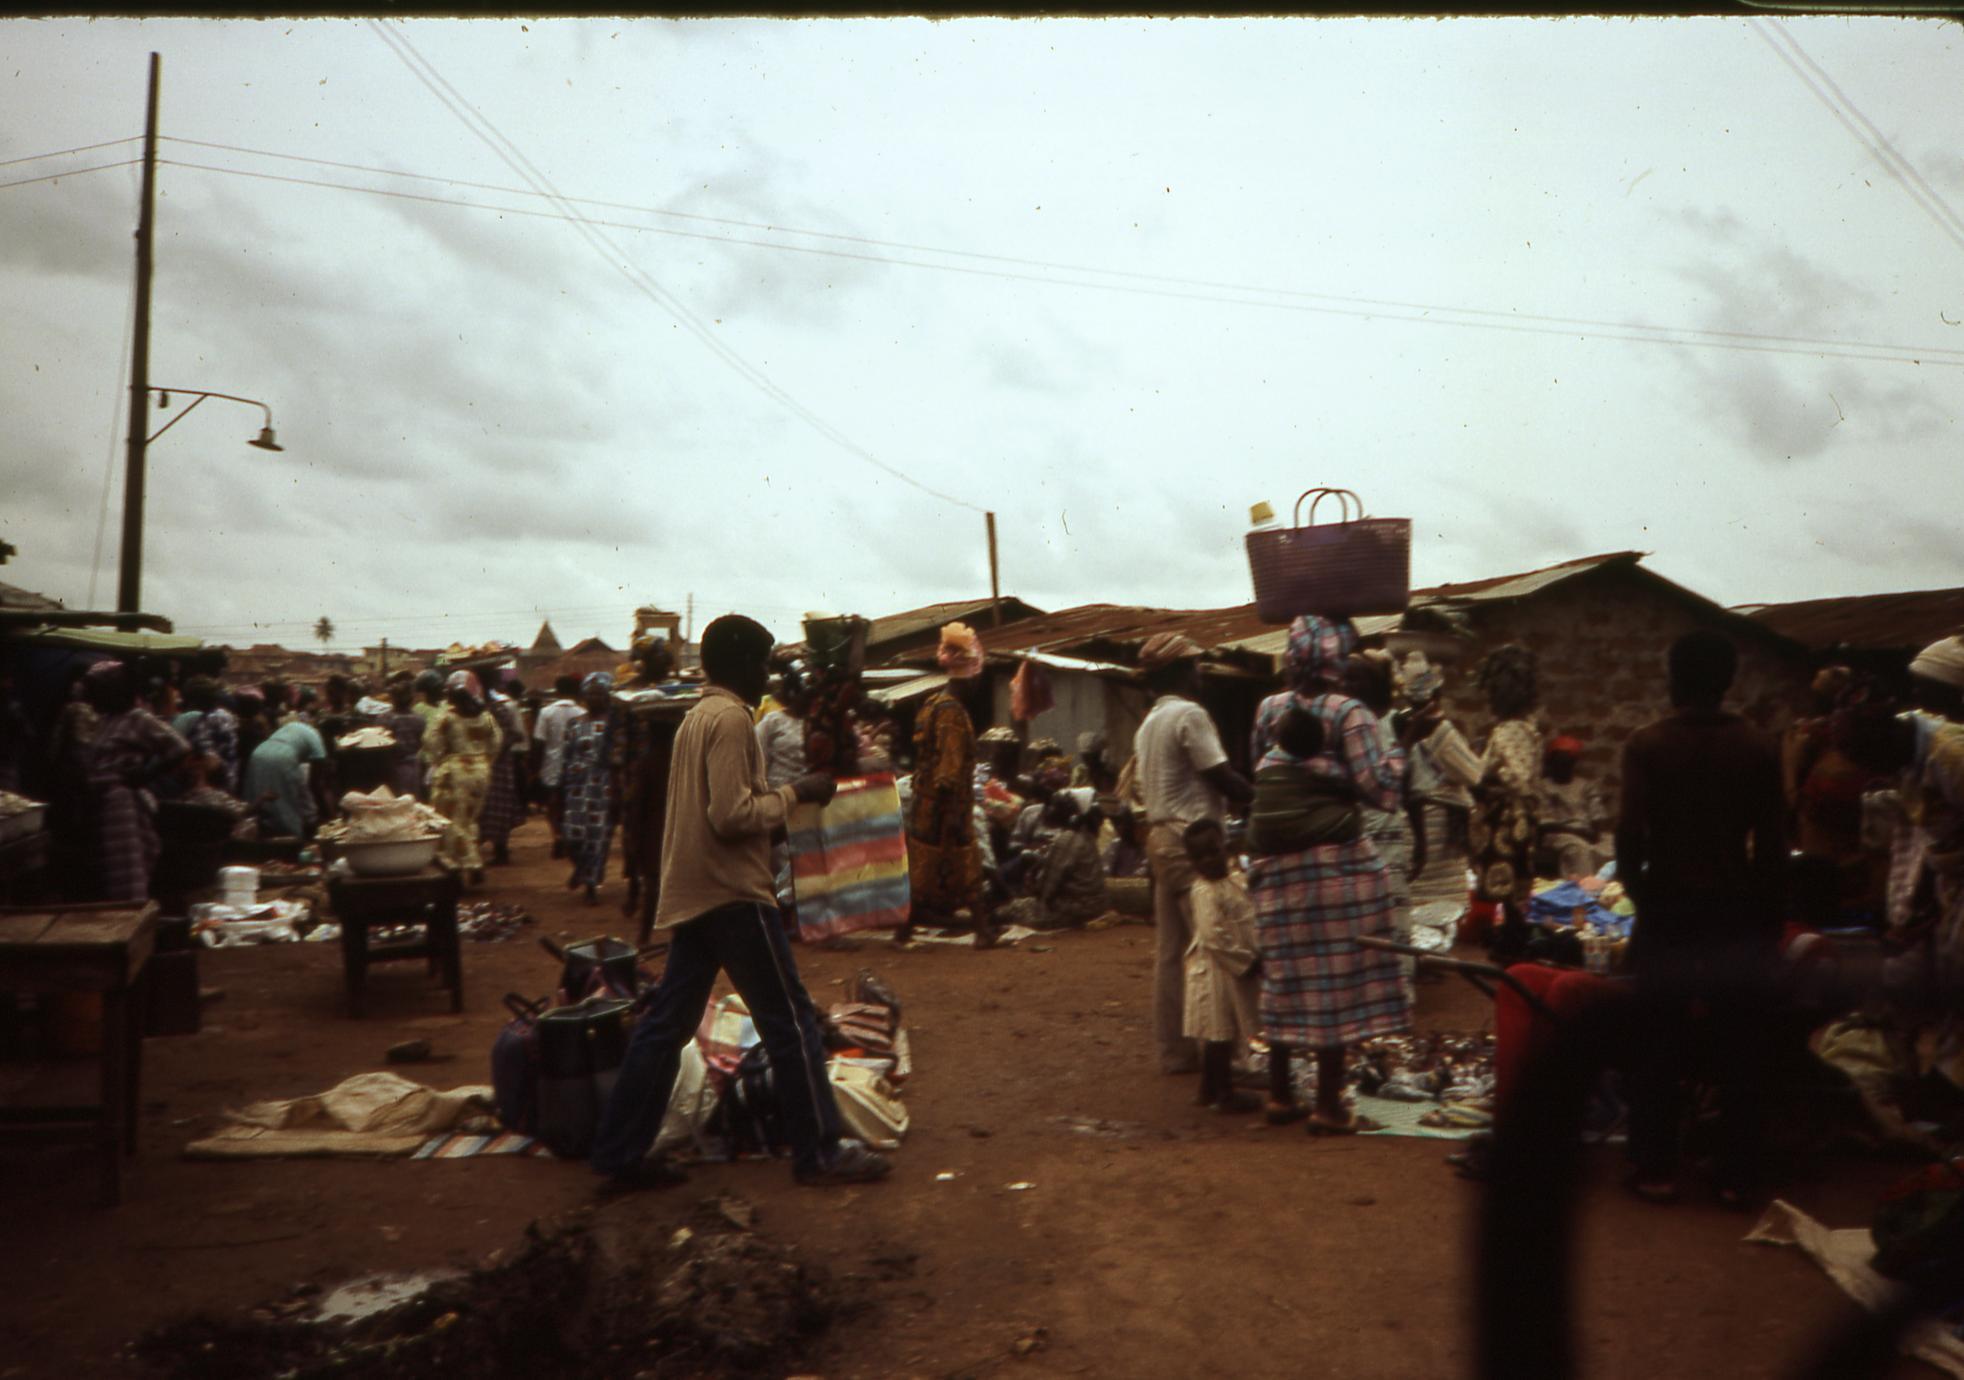 View of Ilesa market